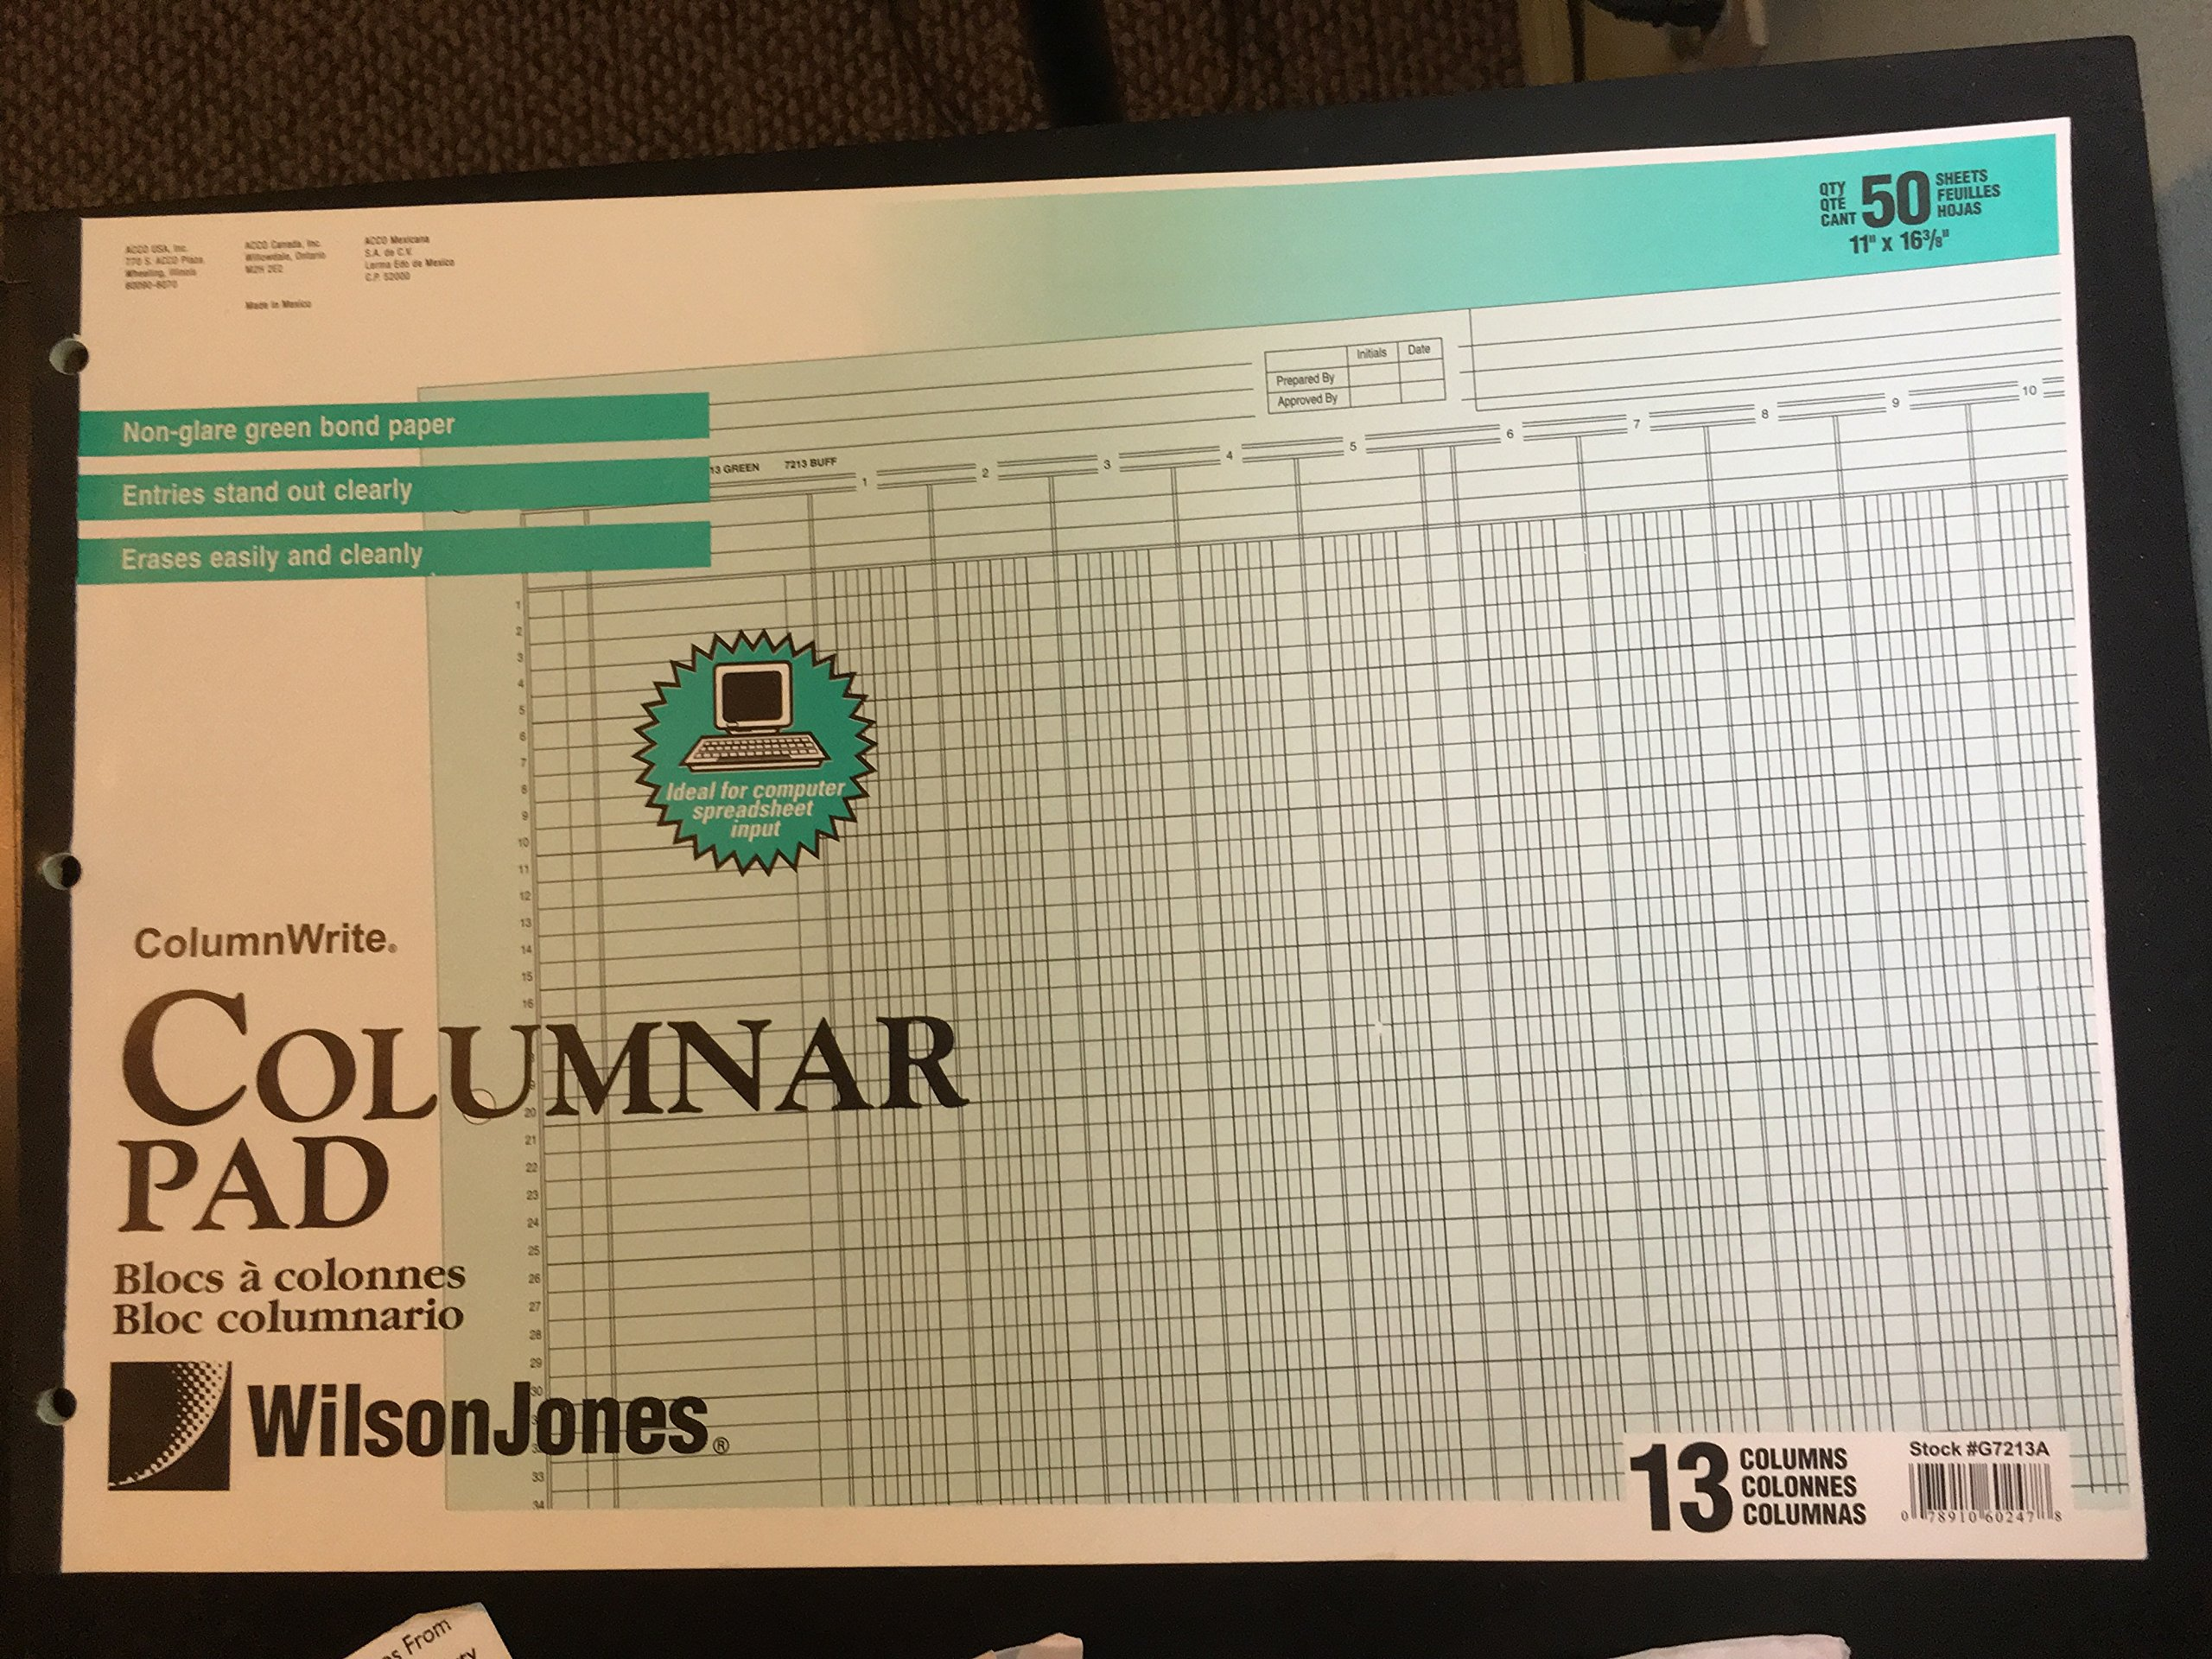 Wilson Jones Accounting Pad/13 8-Unit Columns, 11 x 16.37 Inches, 50-Sheet Pad (G7213A), 2 Packs